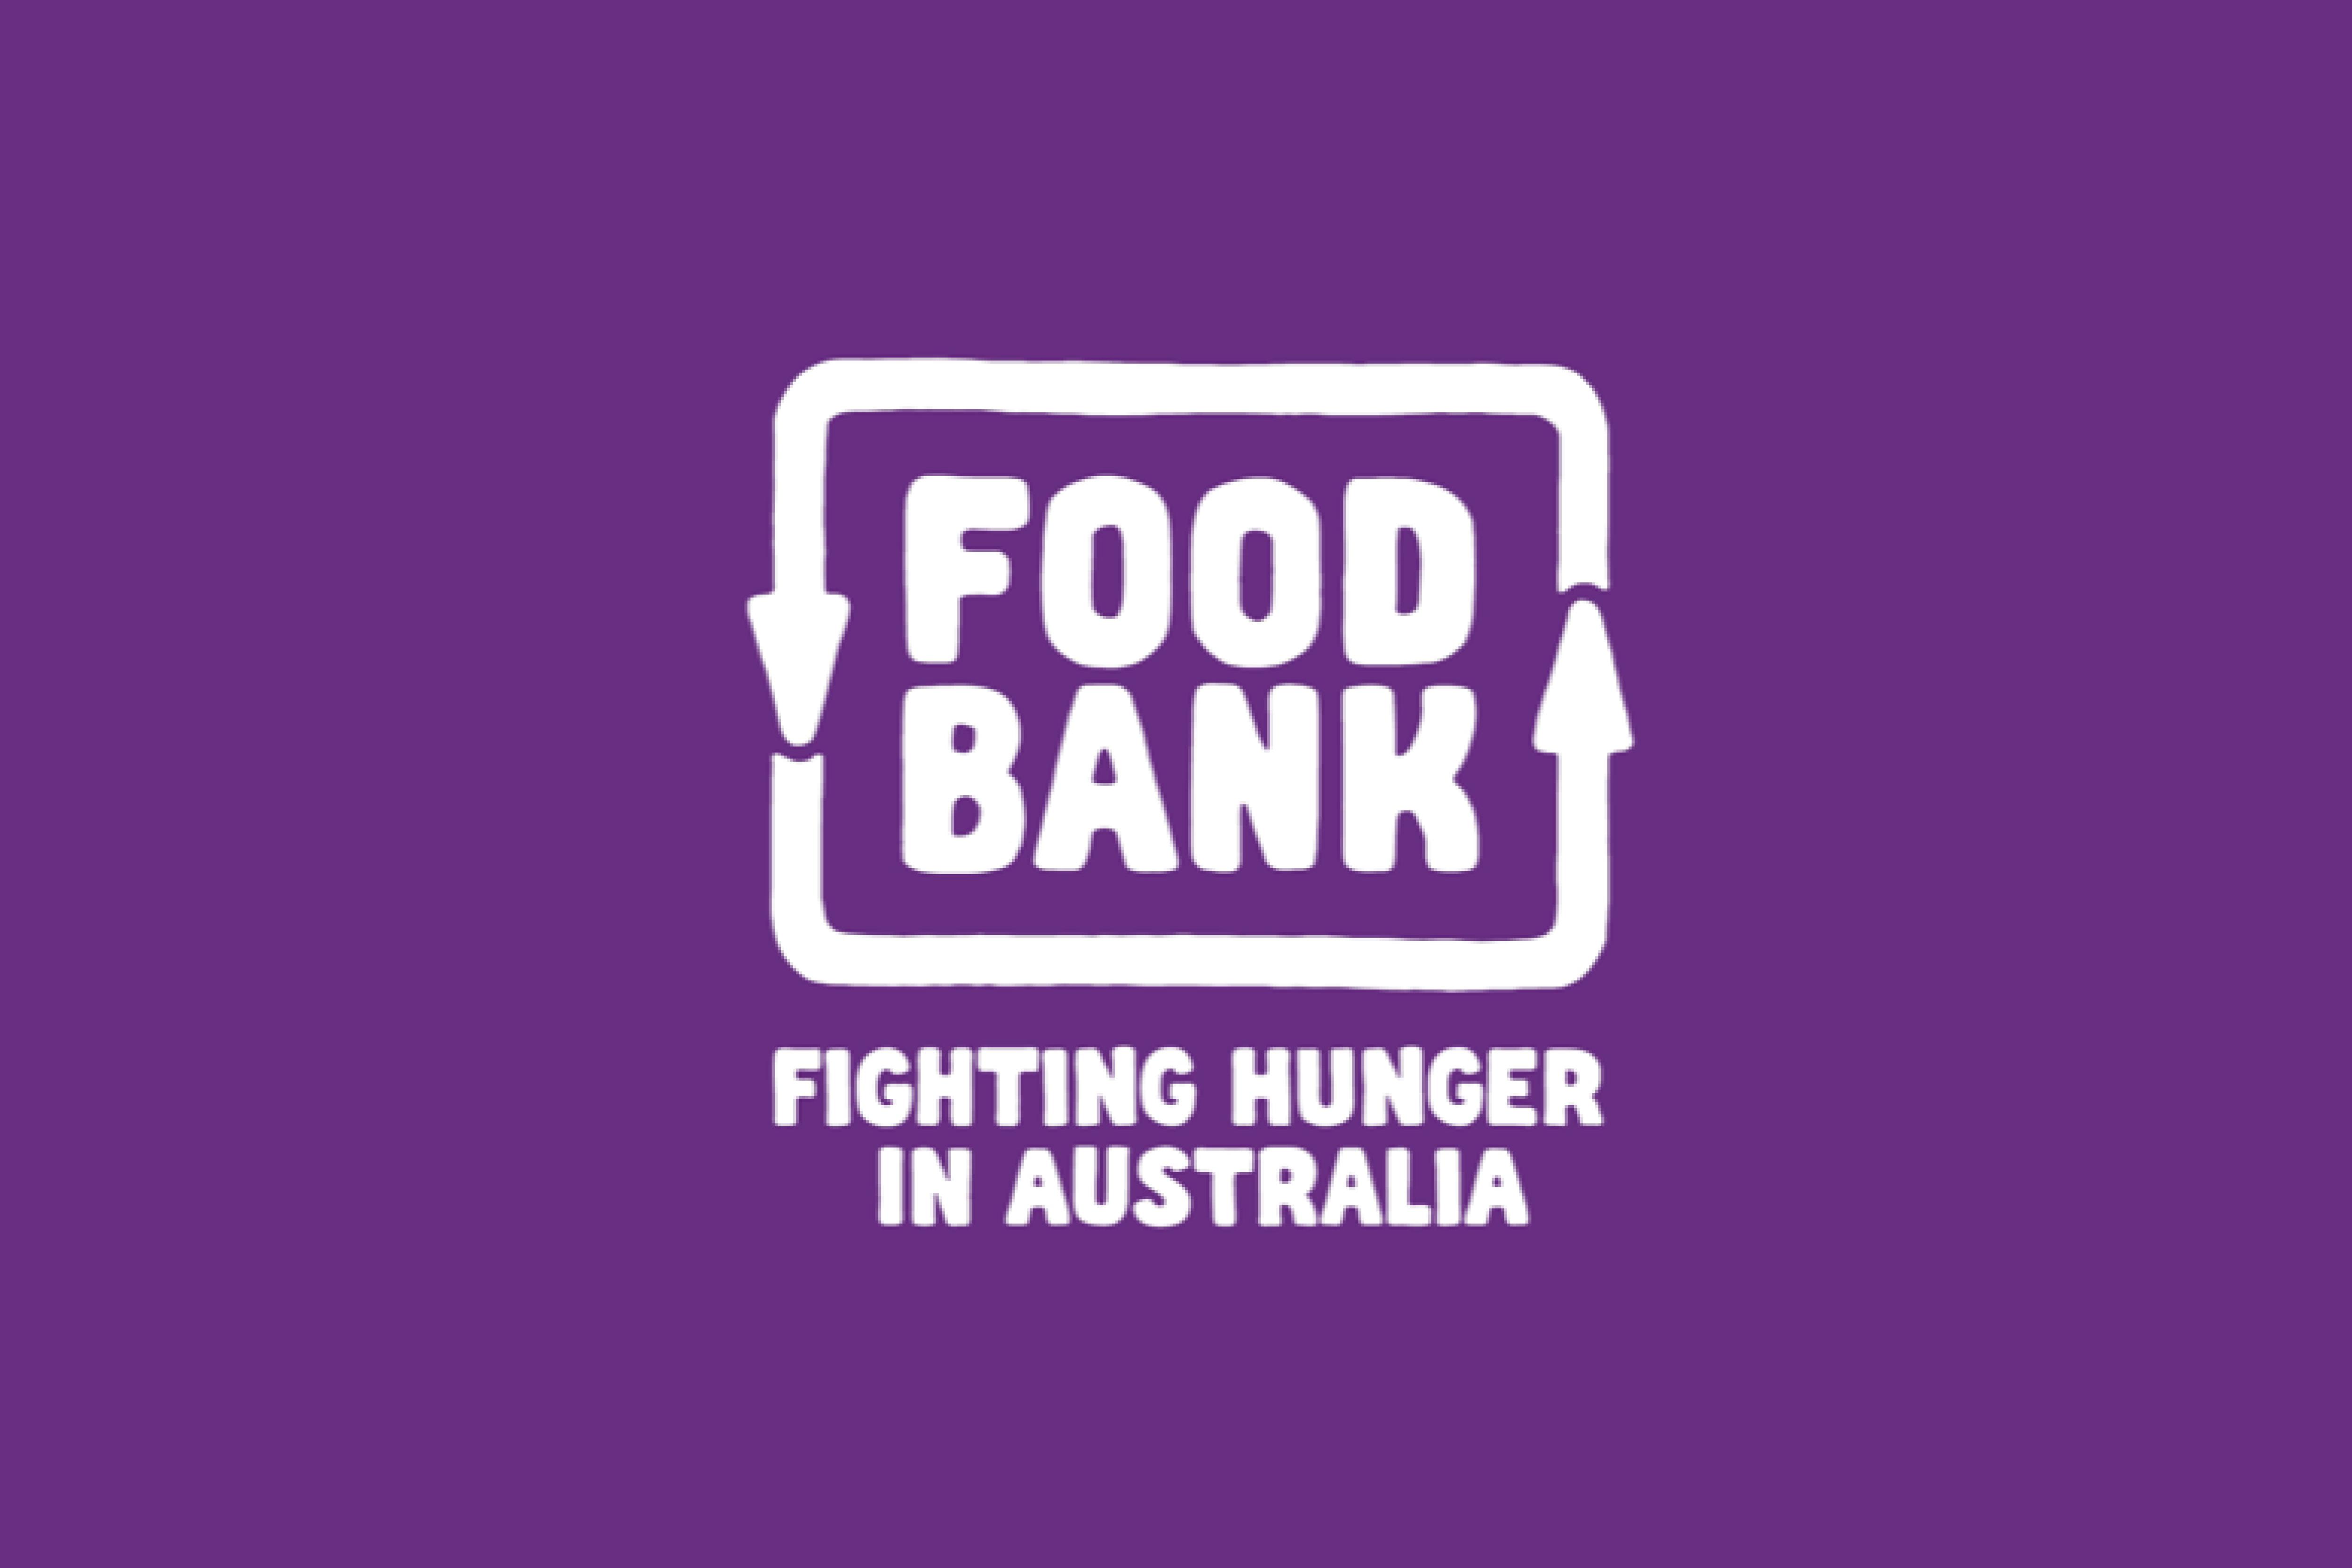 Food Drive - Food Bank Victoria